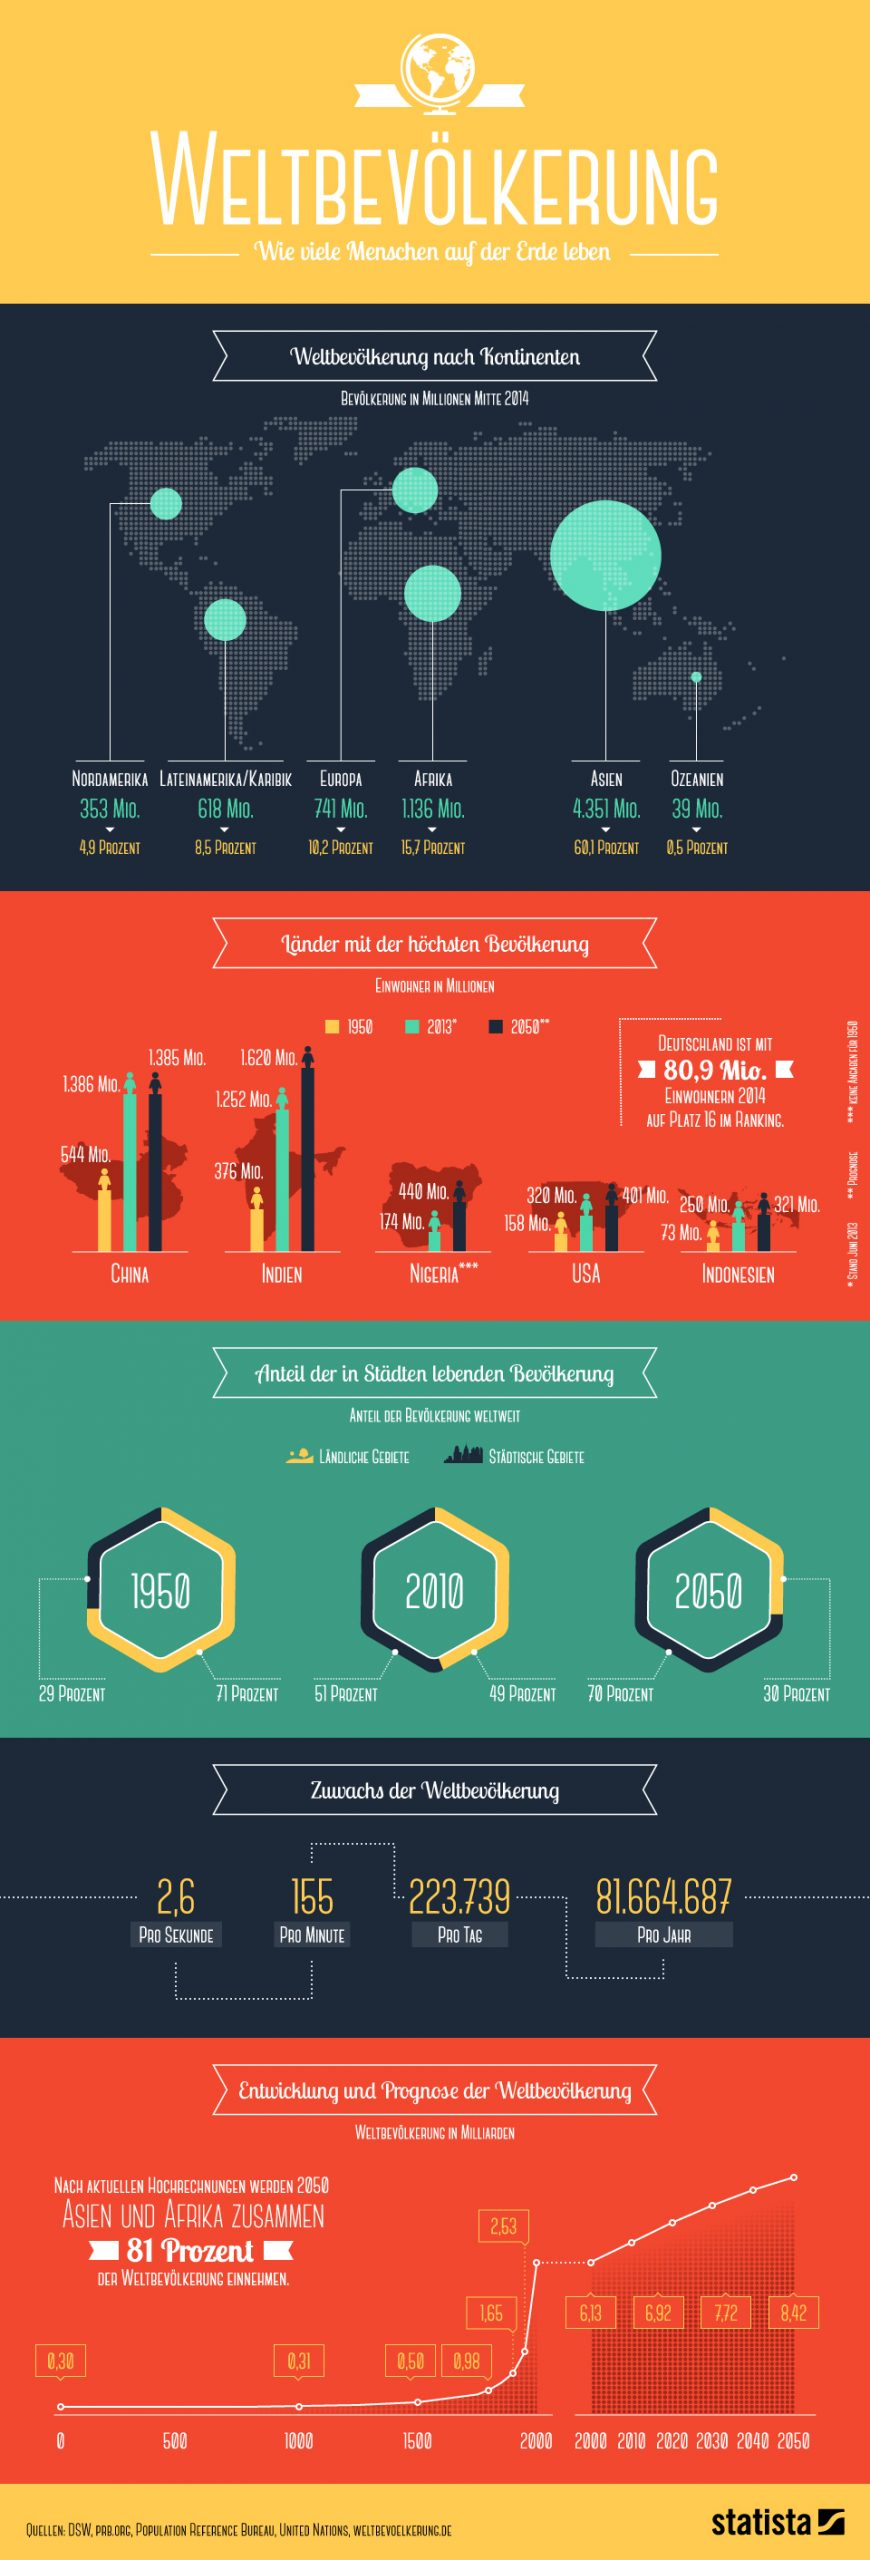 Infografik: Weltbevölkerung - Wie Viele Menschen Auf Der mit Wie Viele Menschen Sind Auf Der Erde